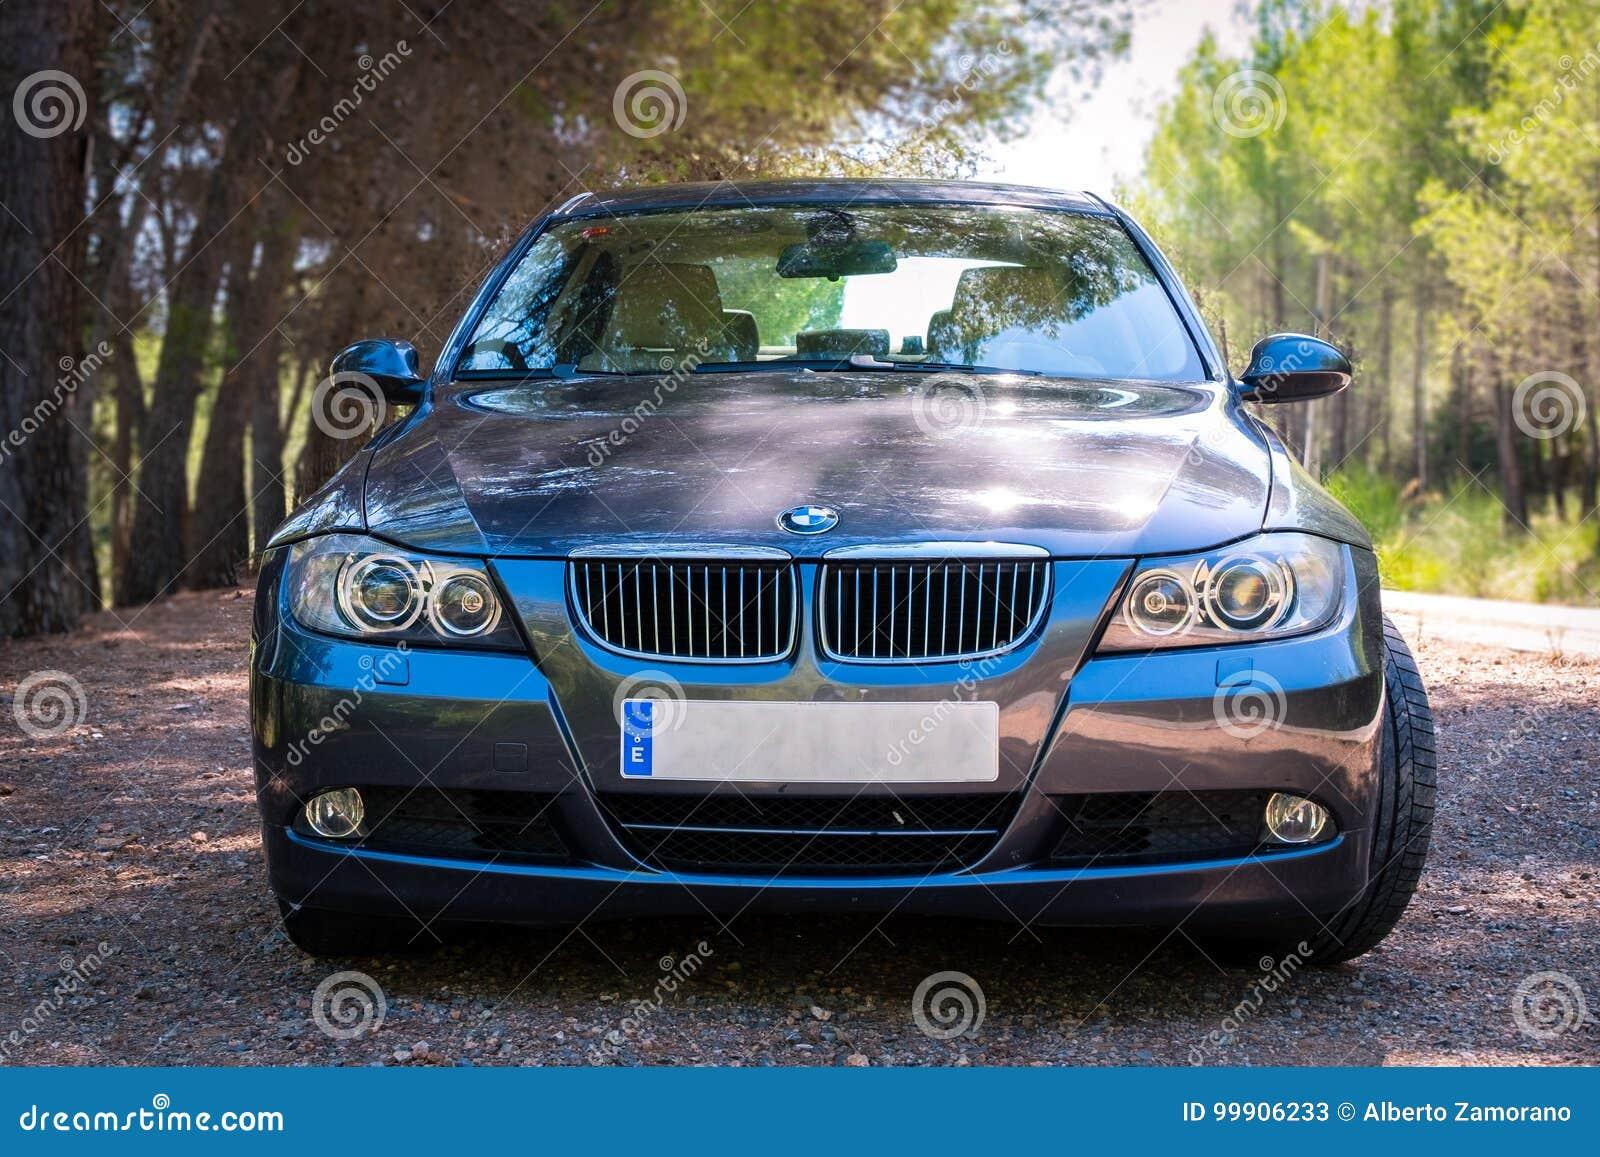 Augusti 2017: Mousserande grafit för BMW 3 serie E90 330i